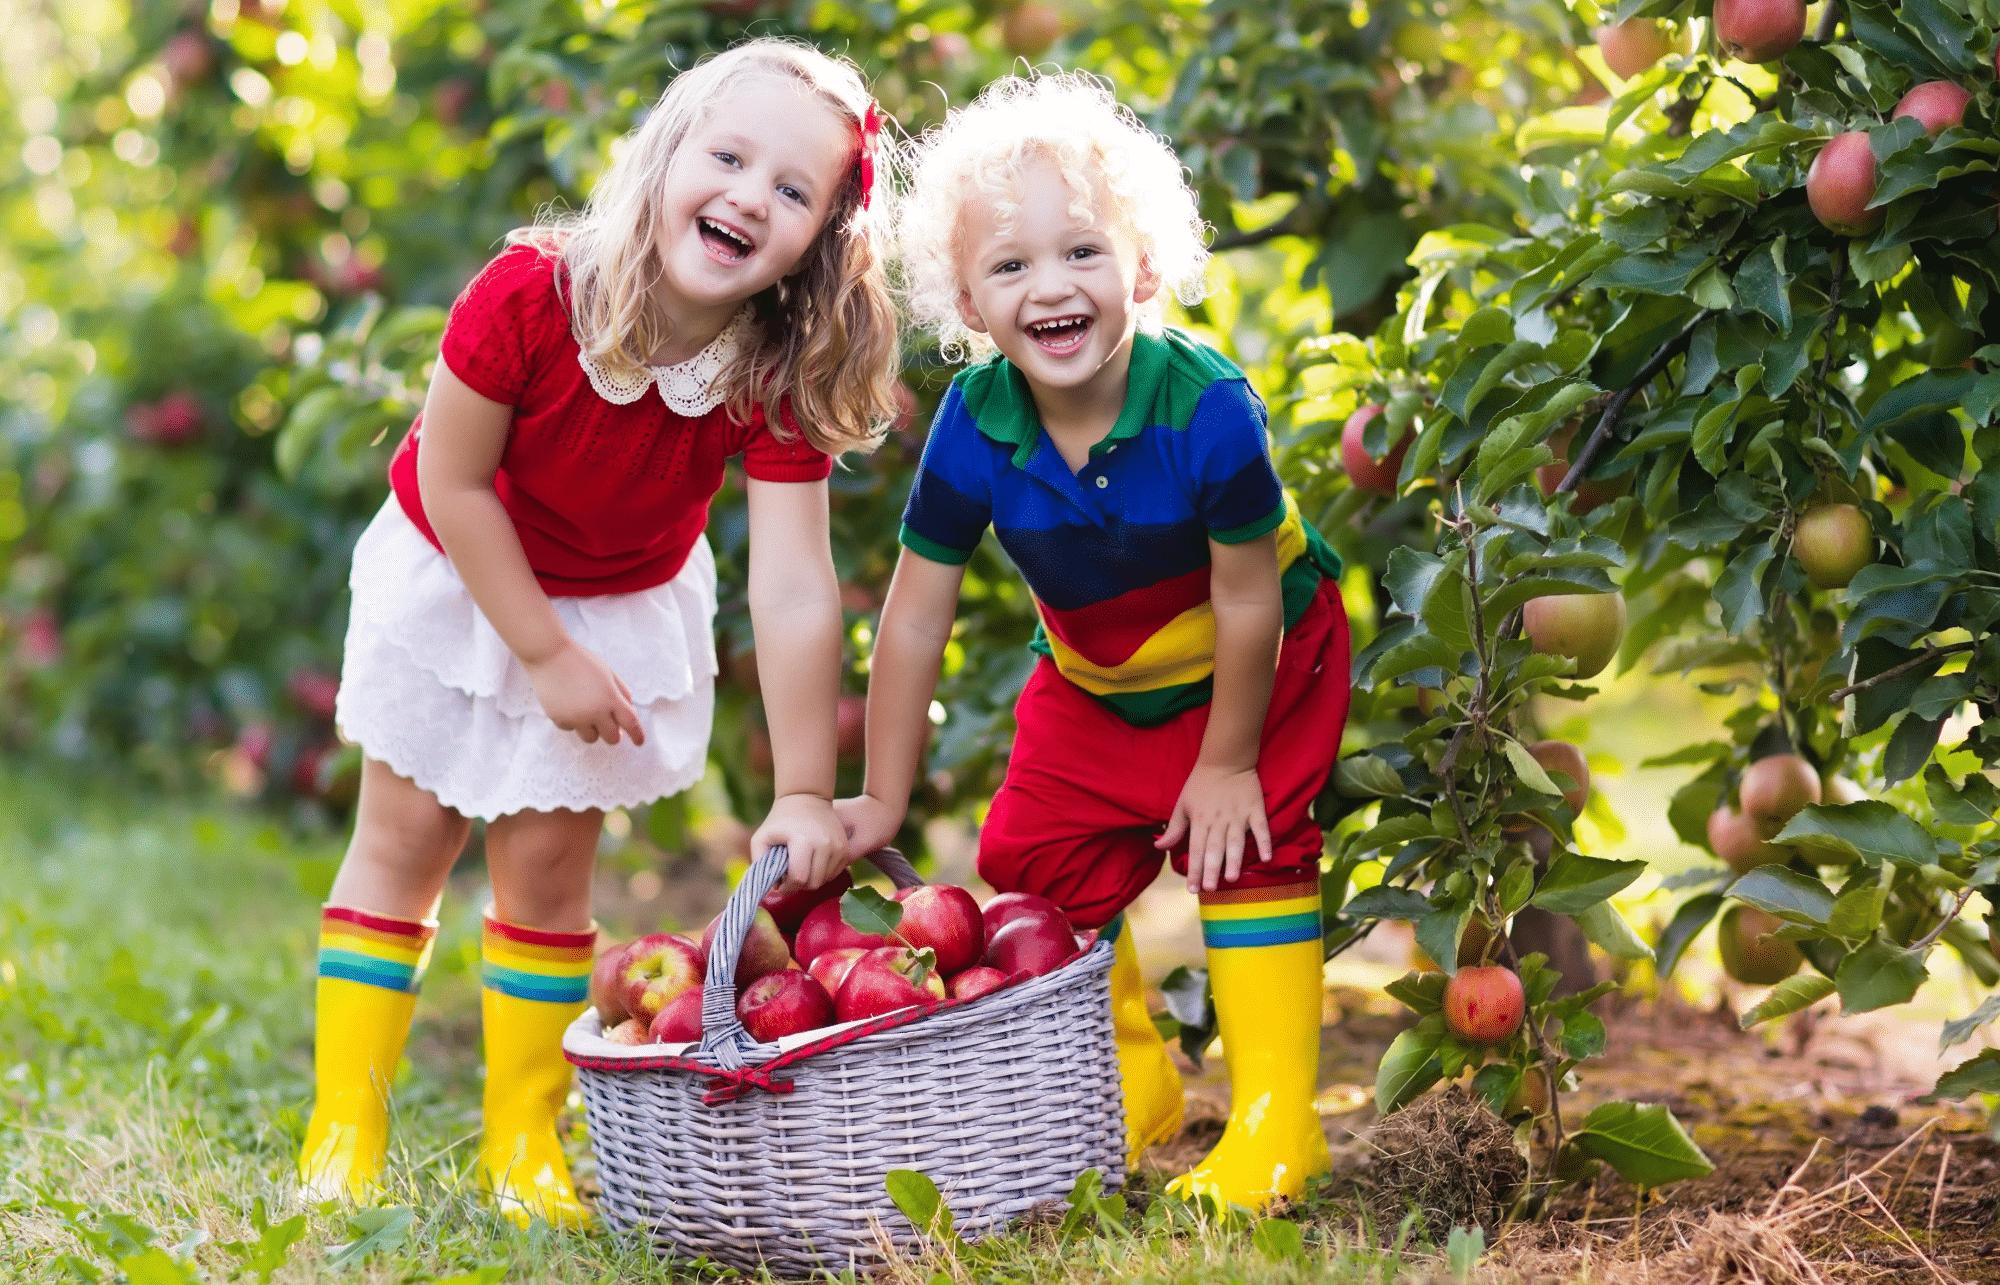 Healthy kids picking apples